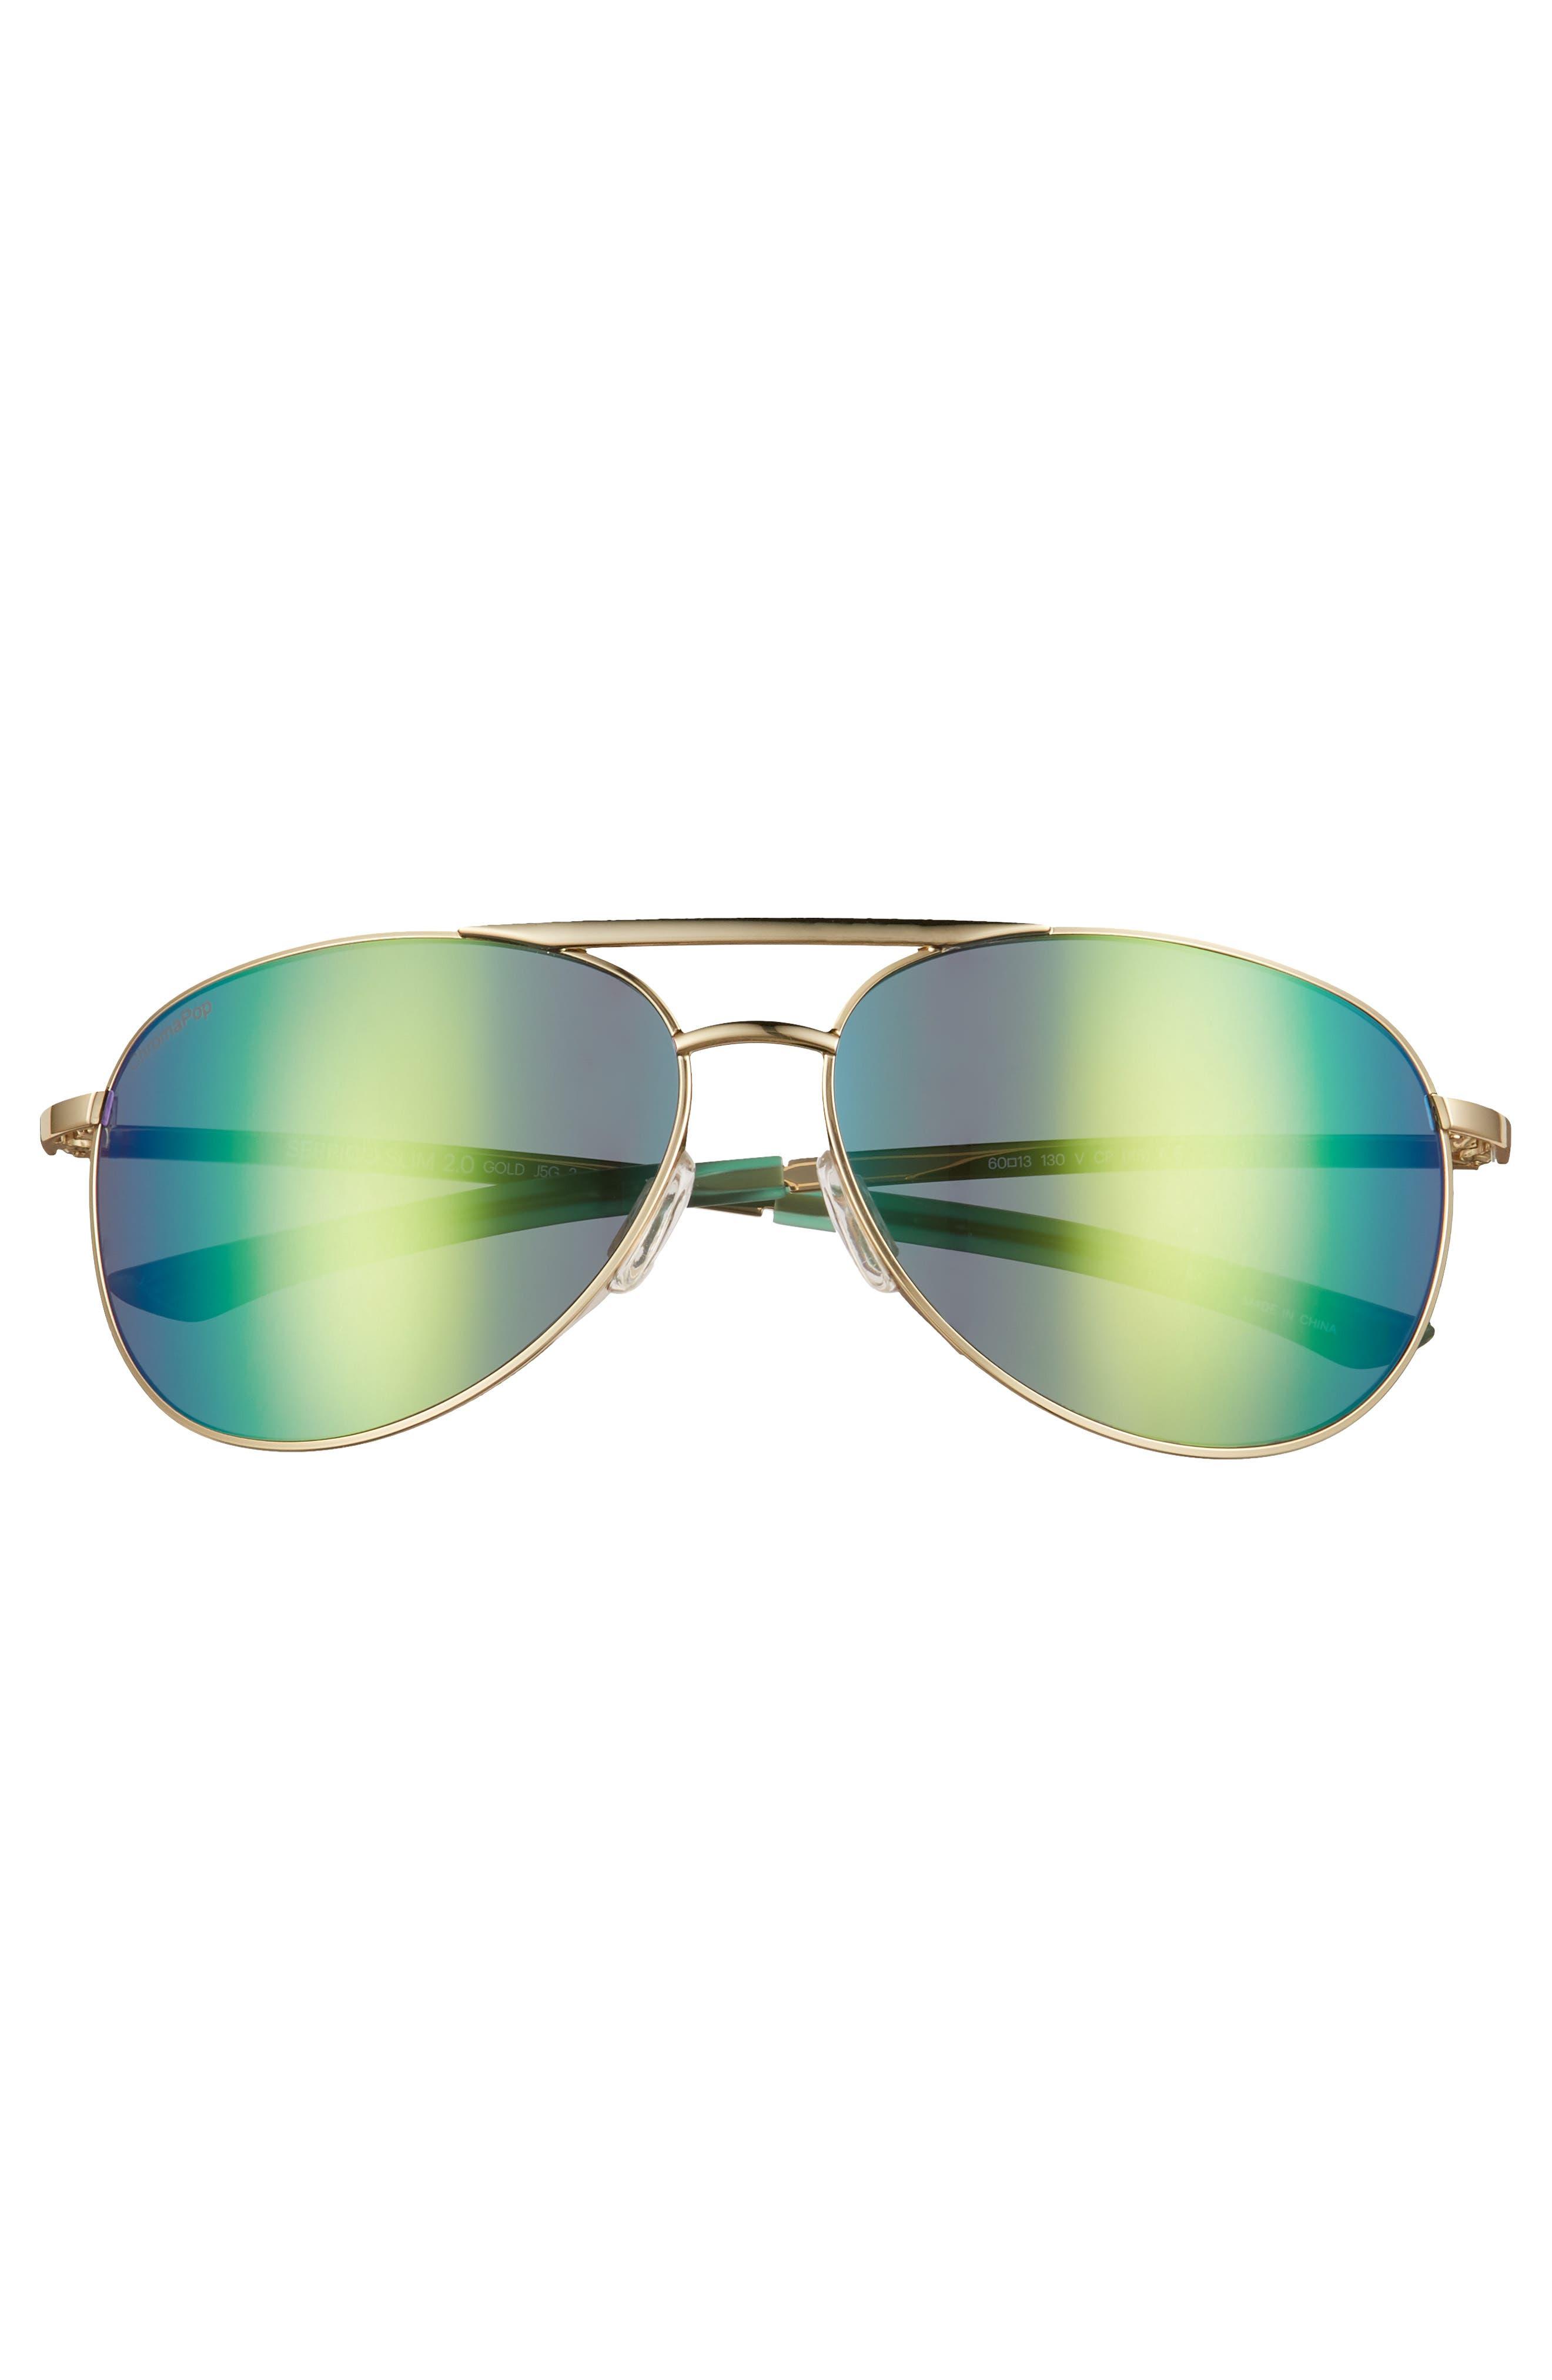 Serpico Slim 2.0 60mm ChromaPop Polarized Aviator Sunglasses,                             Alternate thumbnail 3, color,                             Gold/ Green Mirror